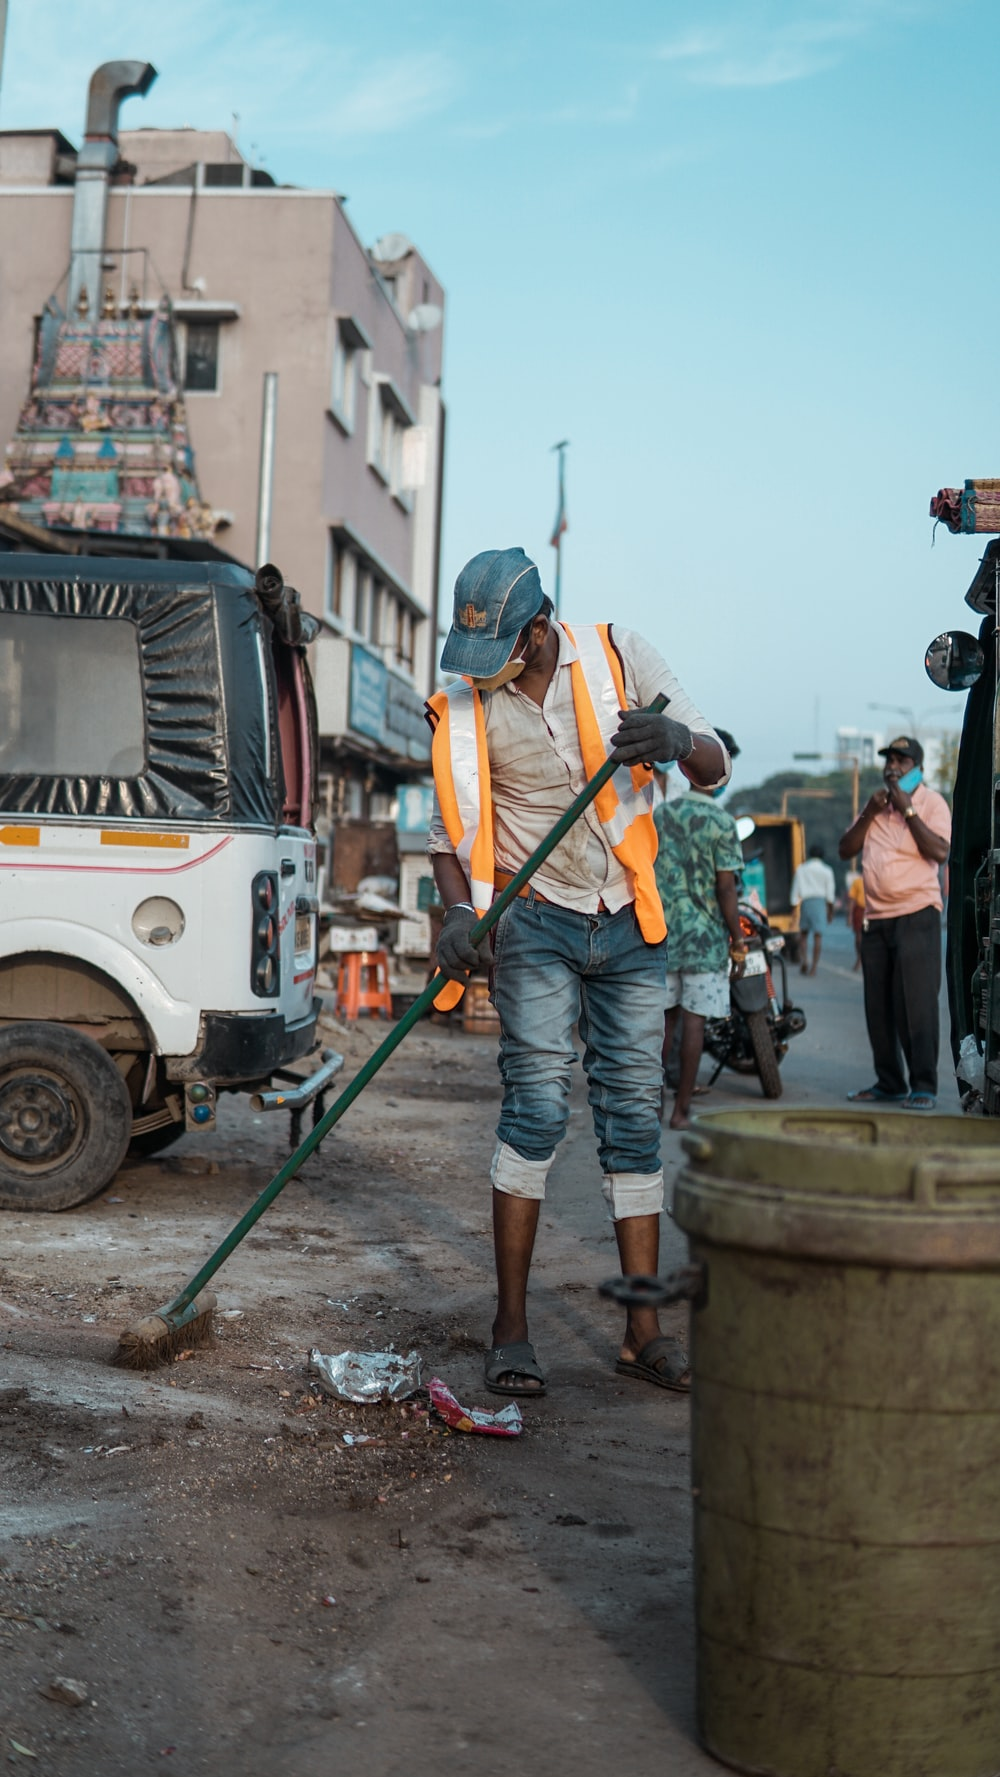 man in orange vest and blue denim jeans standing on white truck during daytime